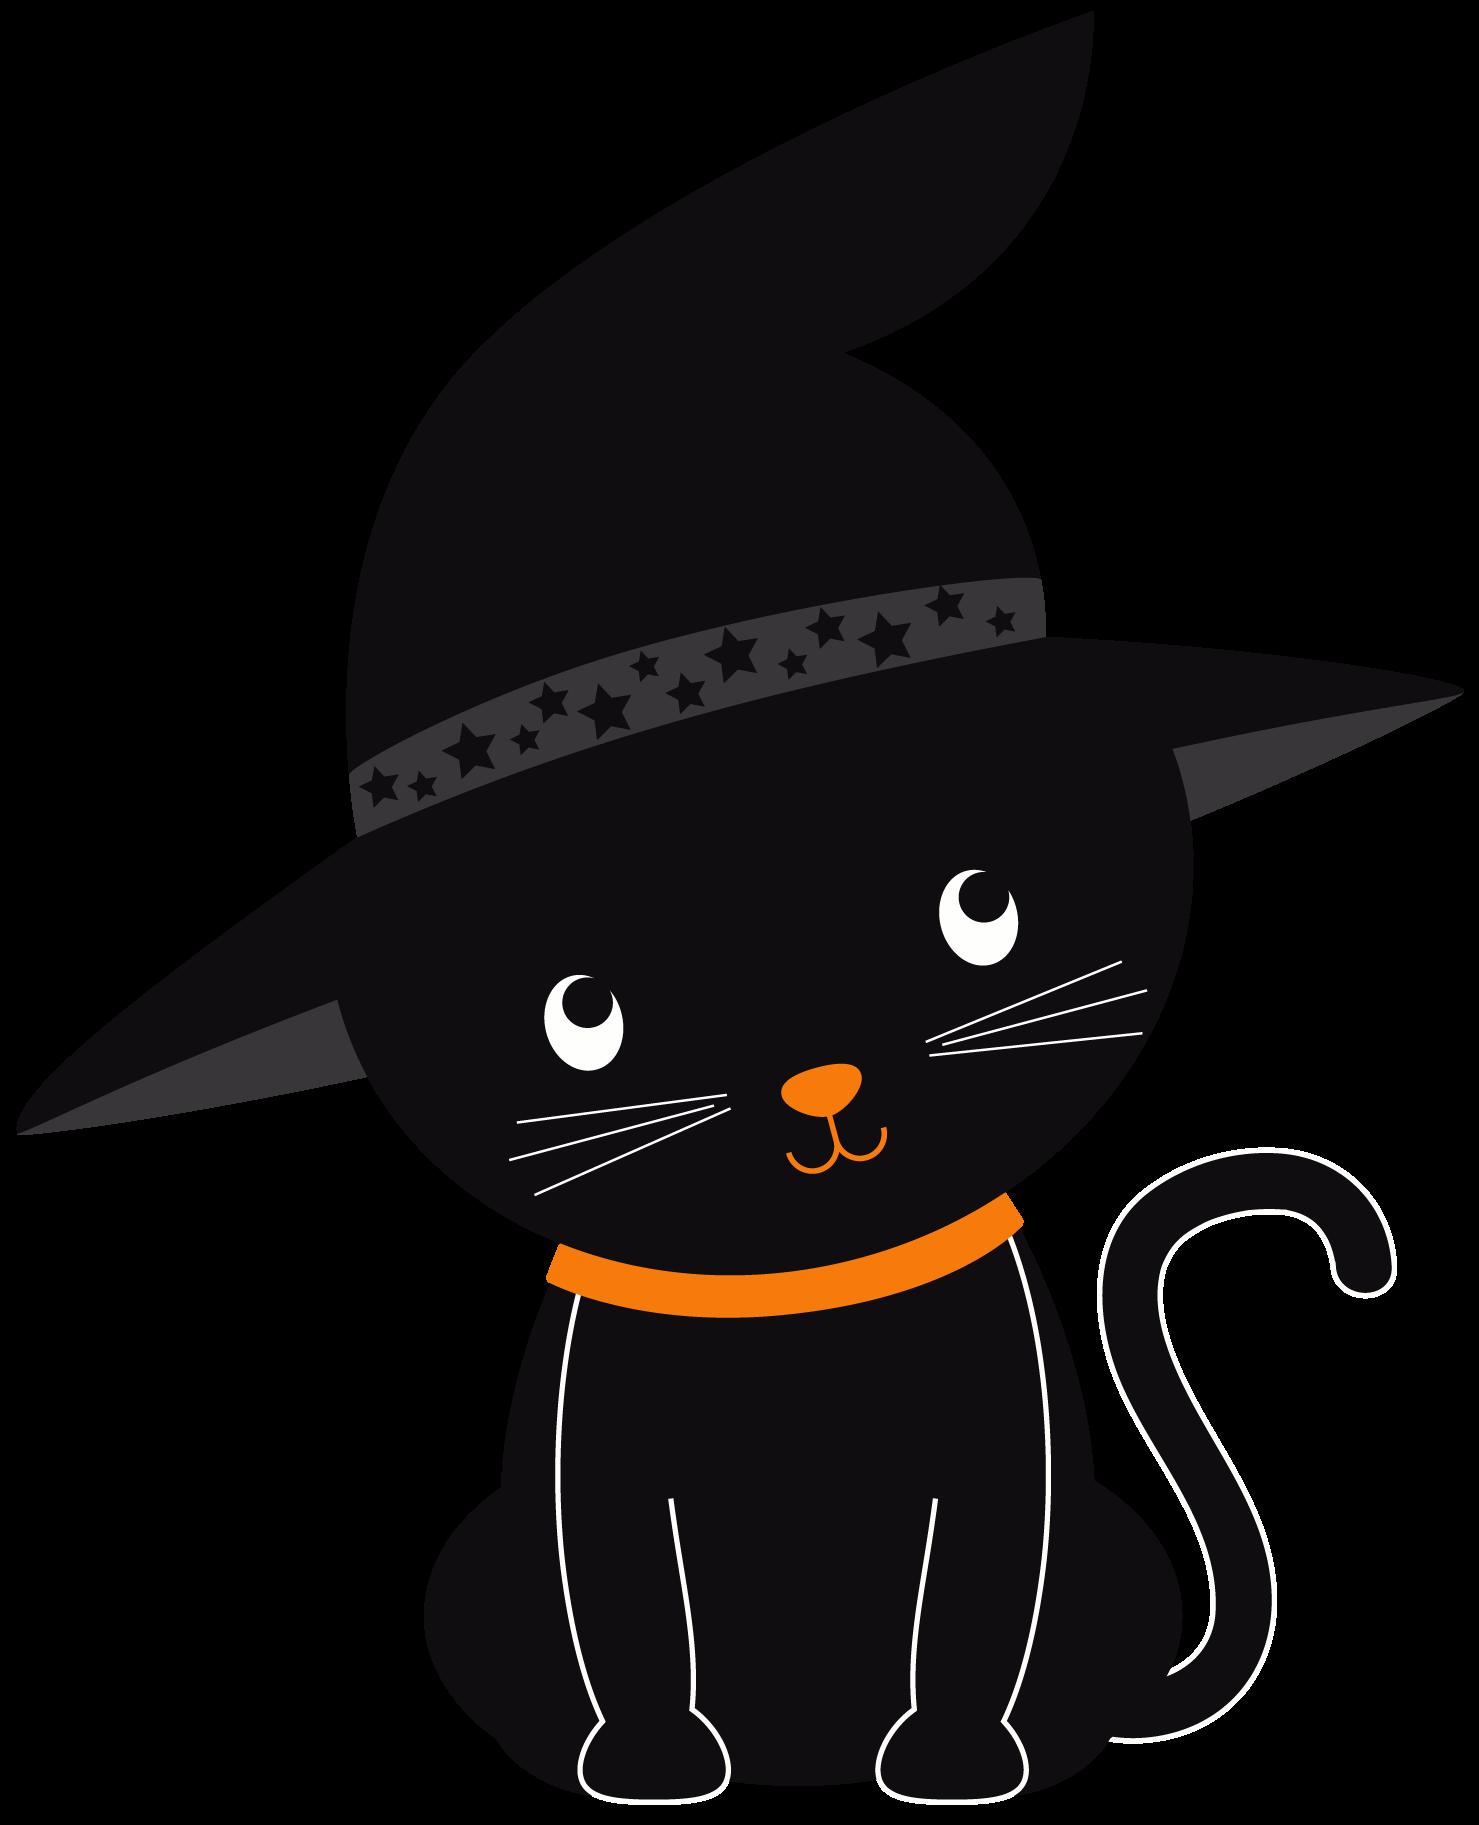 Halloween clipart black background download Cute Halloween Cat Clipart | Free download best Cute Halloween Cat ... download